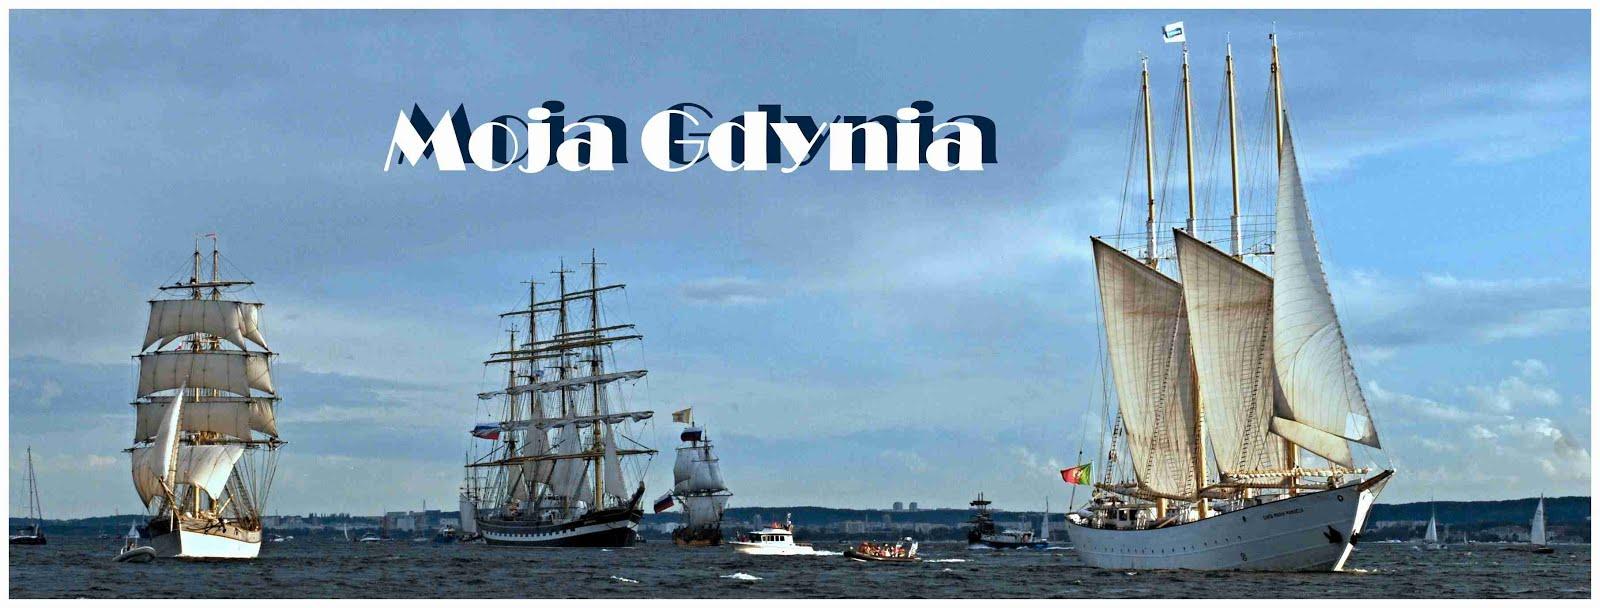 Moja Gdynia